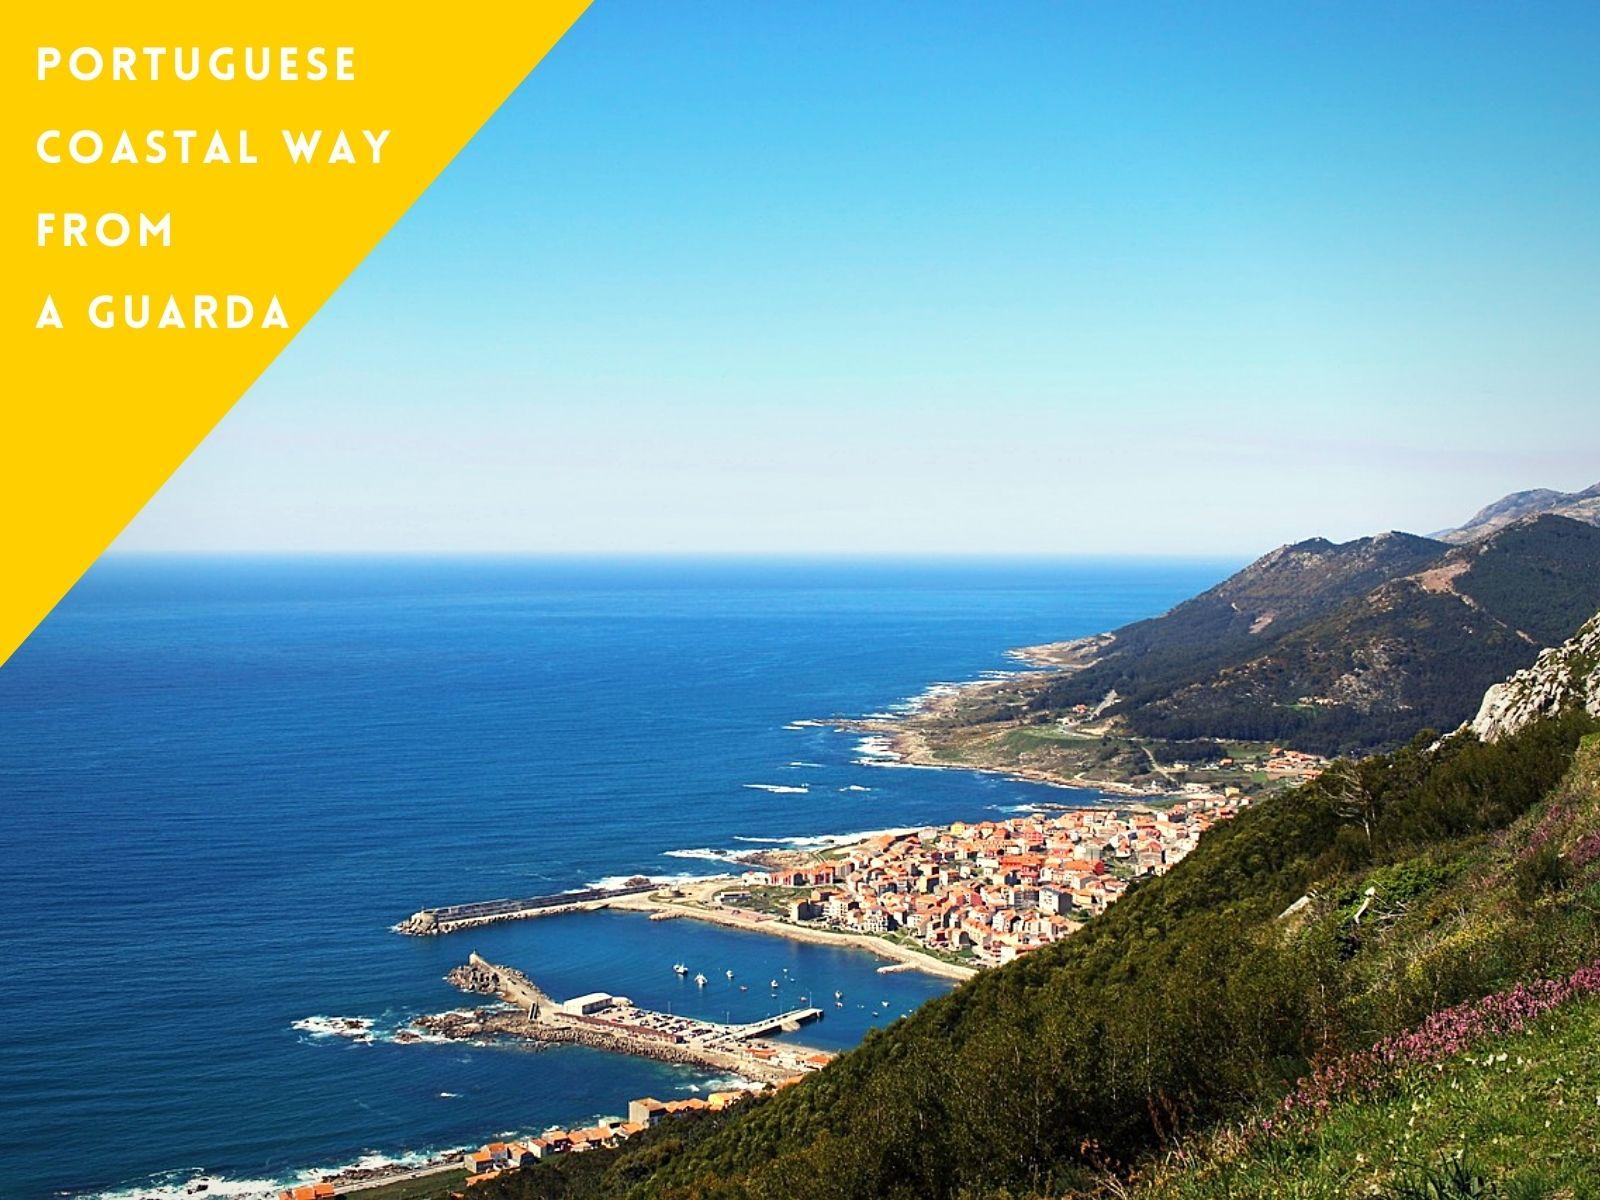 Portuguese Coastal Way from A Guarda